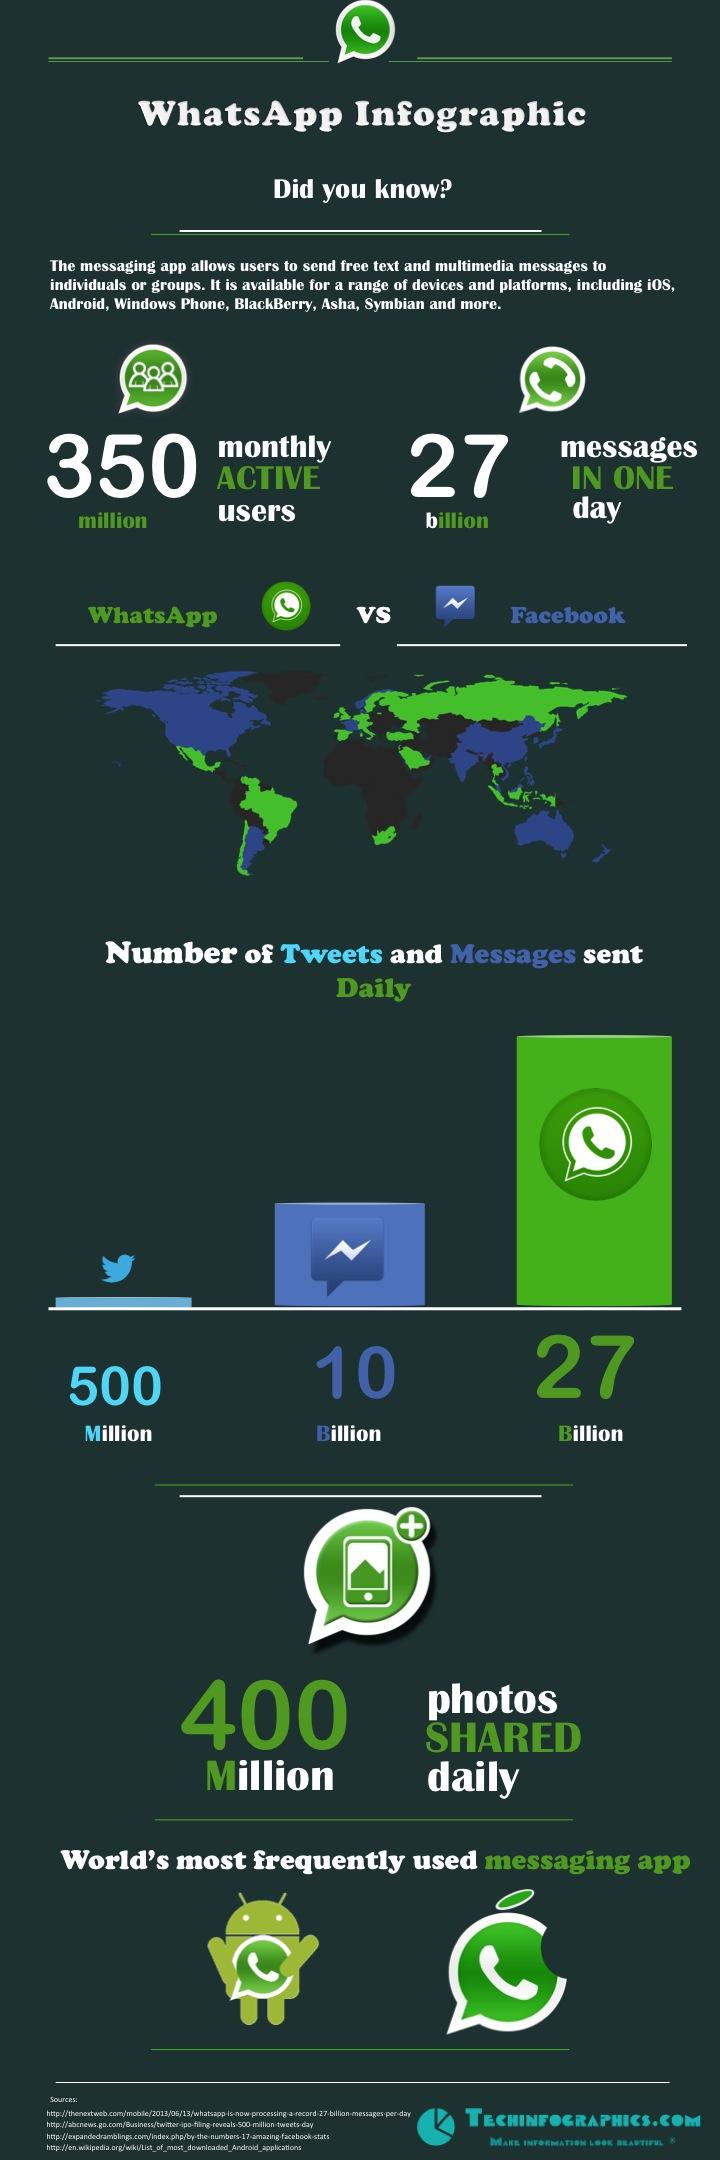 WhatsApp frente a Twitter y FaceBook